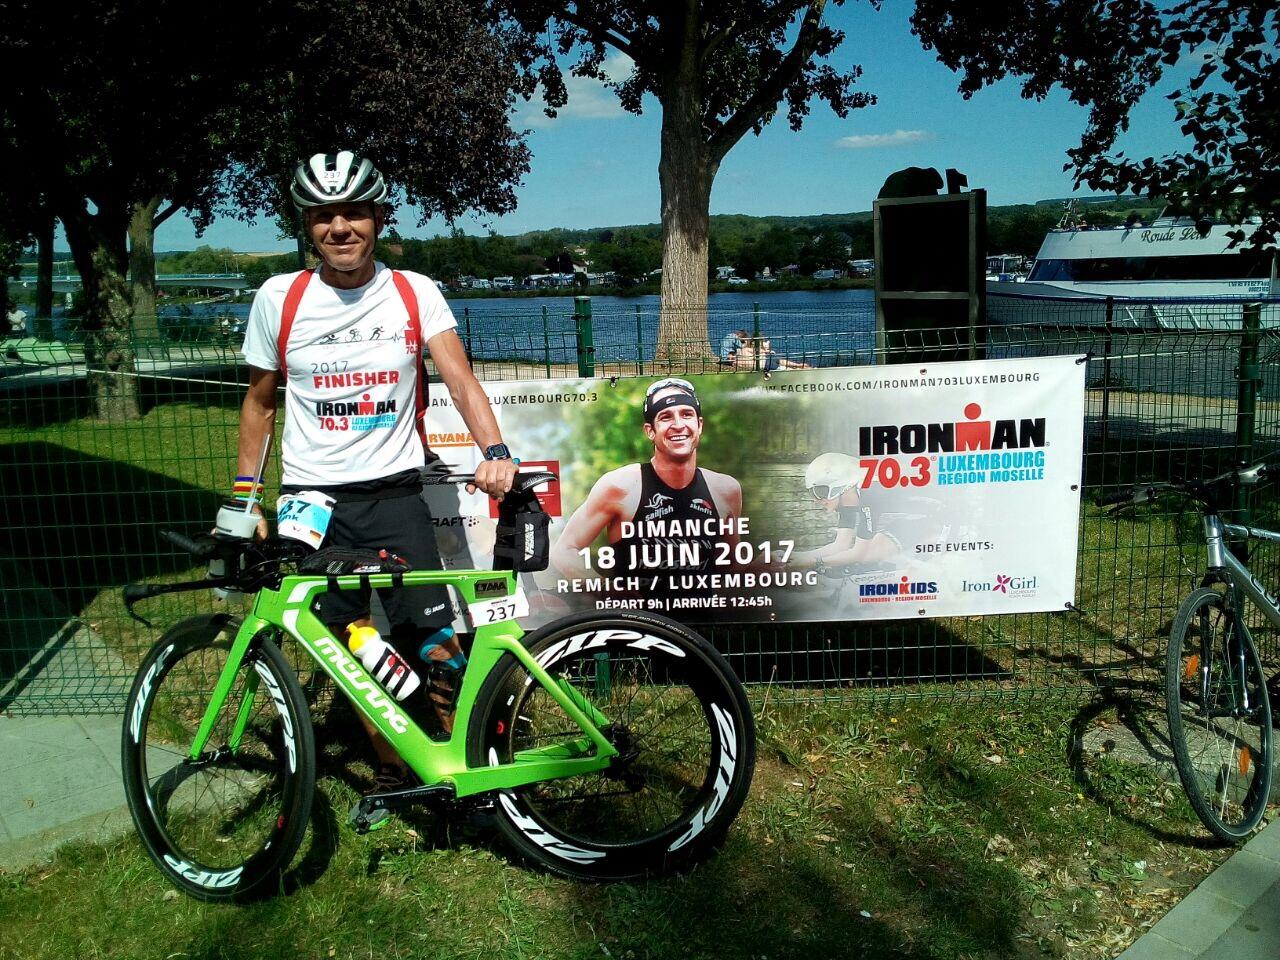 Ironman 70.3 in Luxemburg